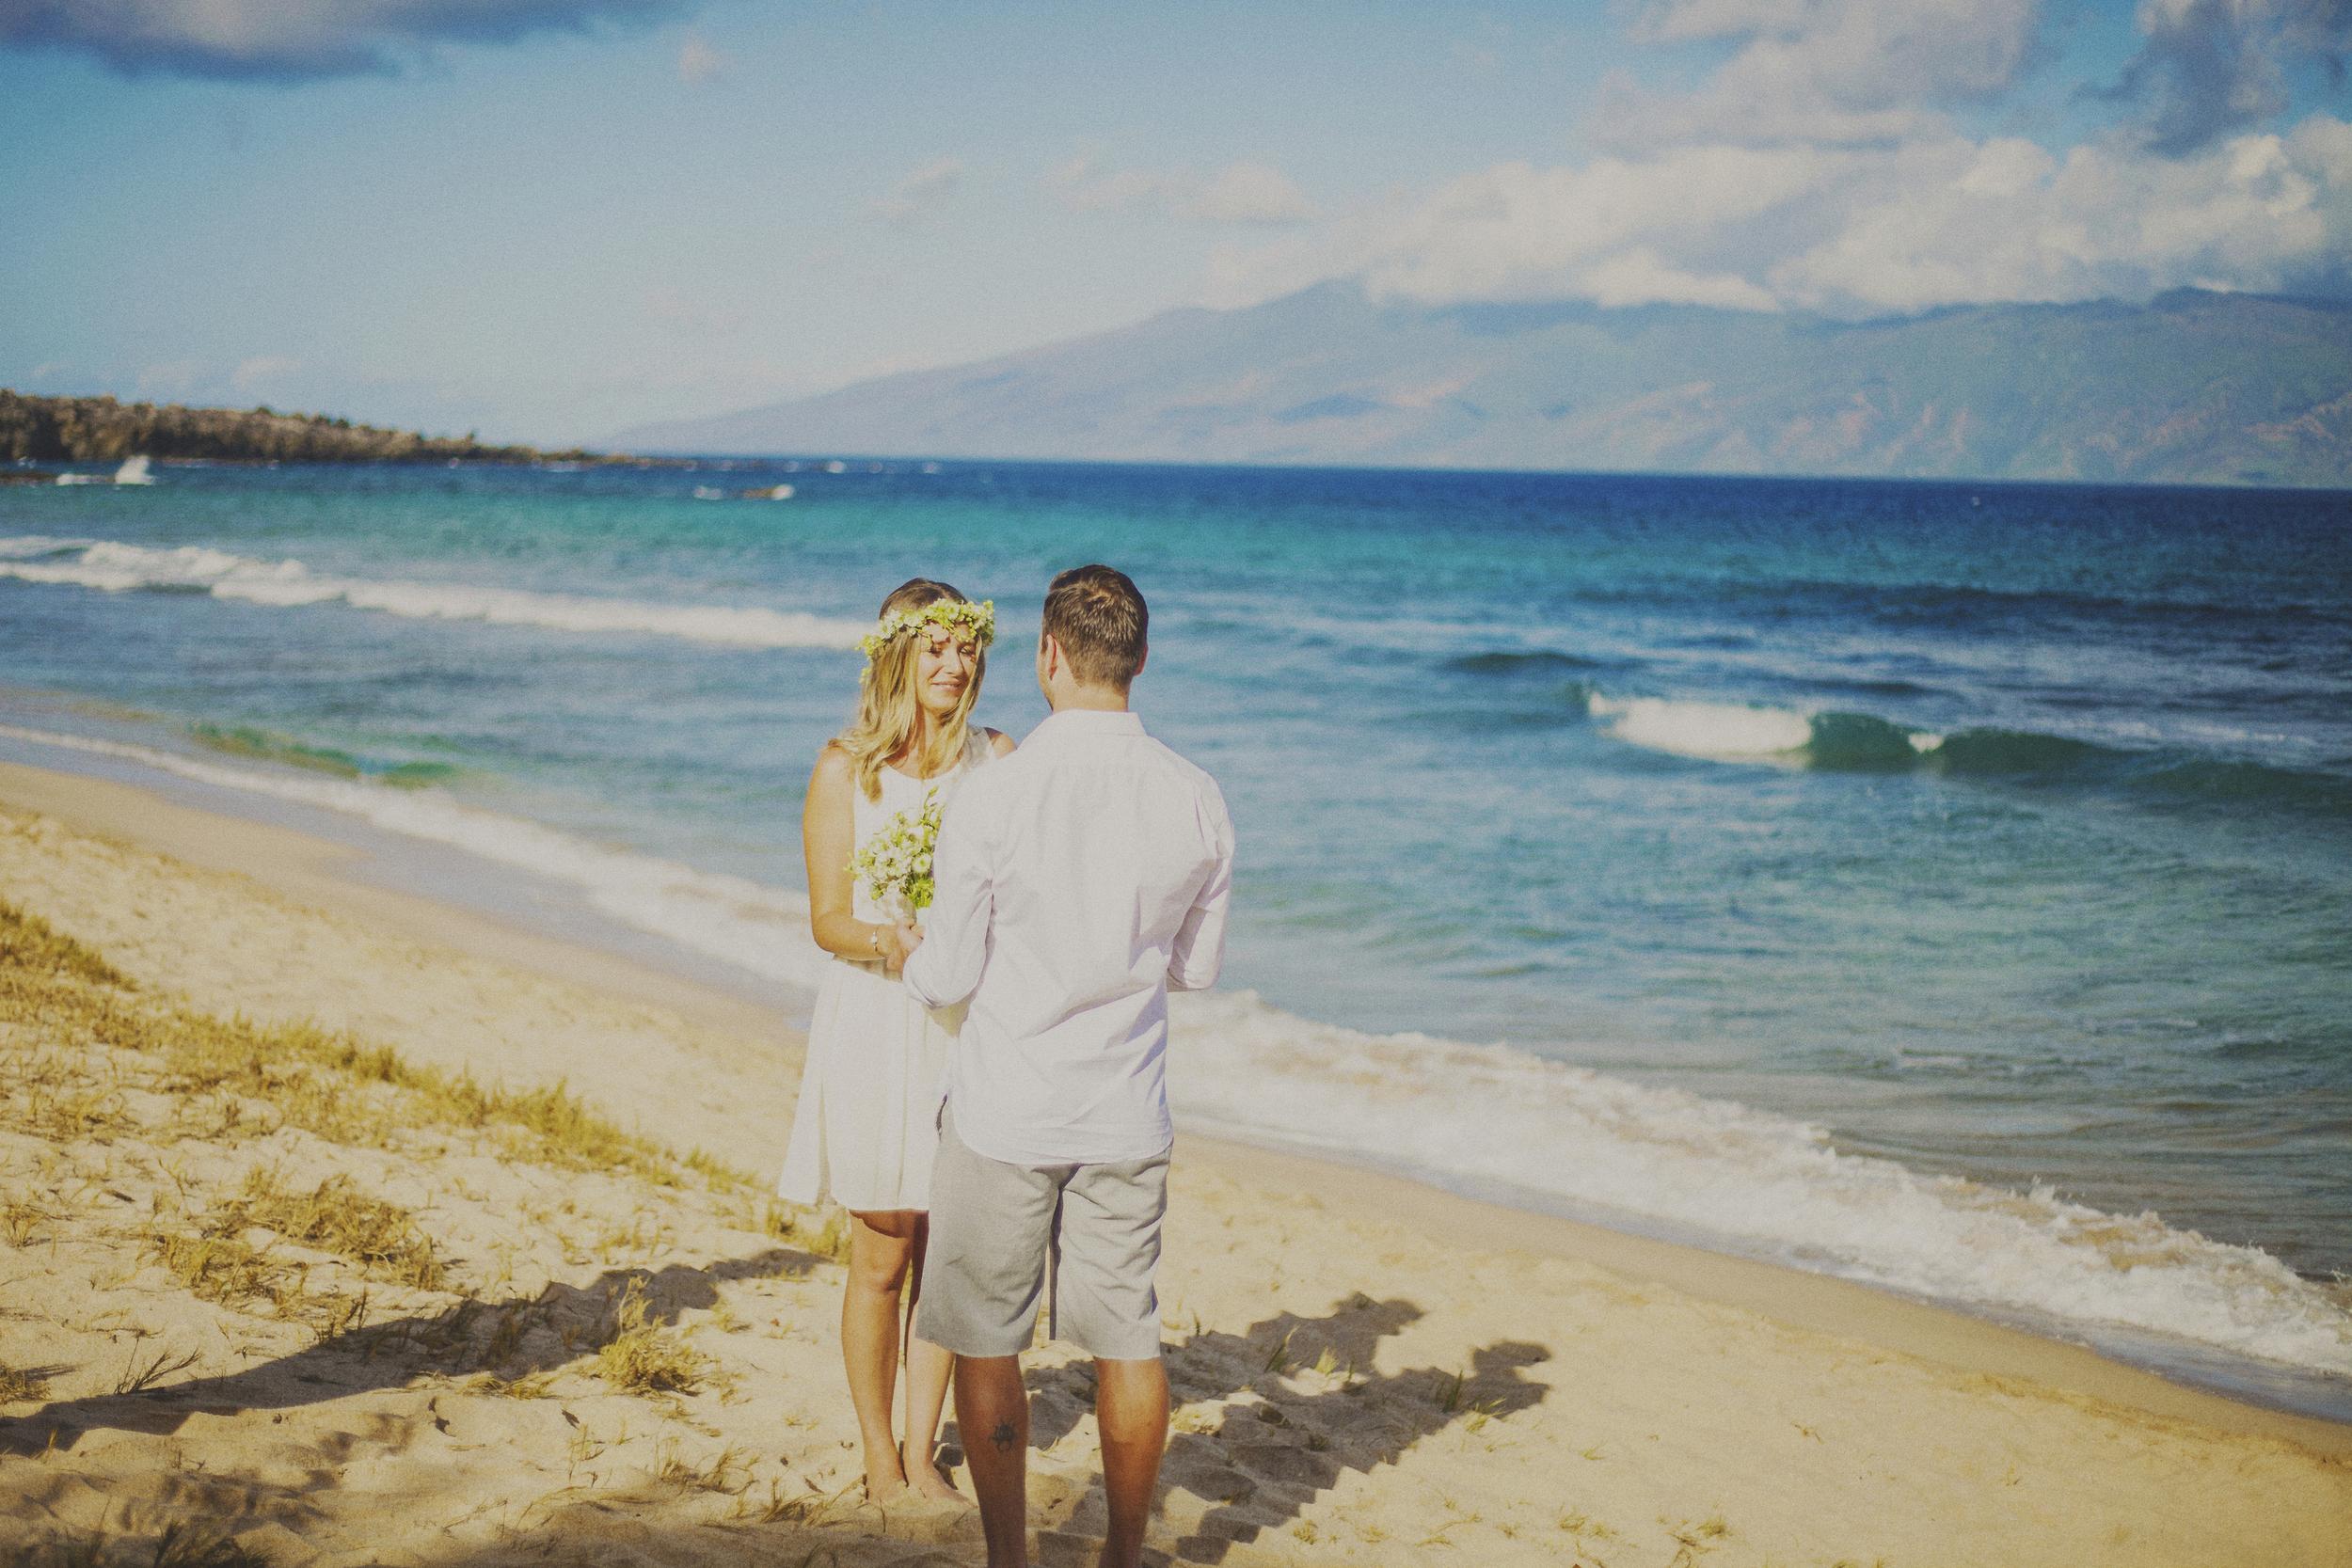 angie-diaz-photography-maui-elopement-oneloa-ironwoods-beach-3.jpg